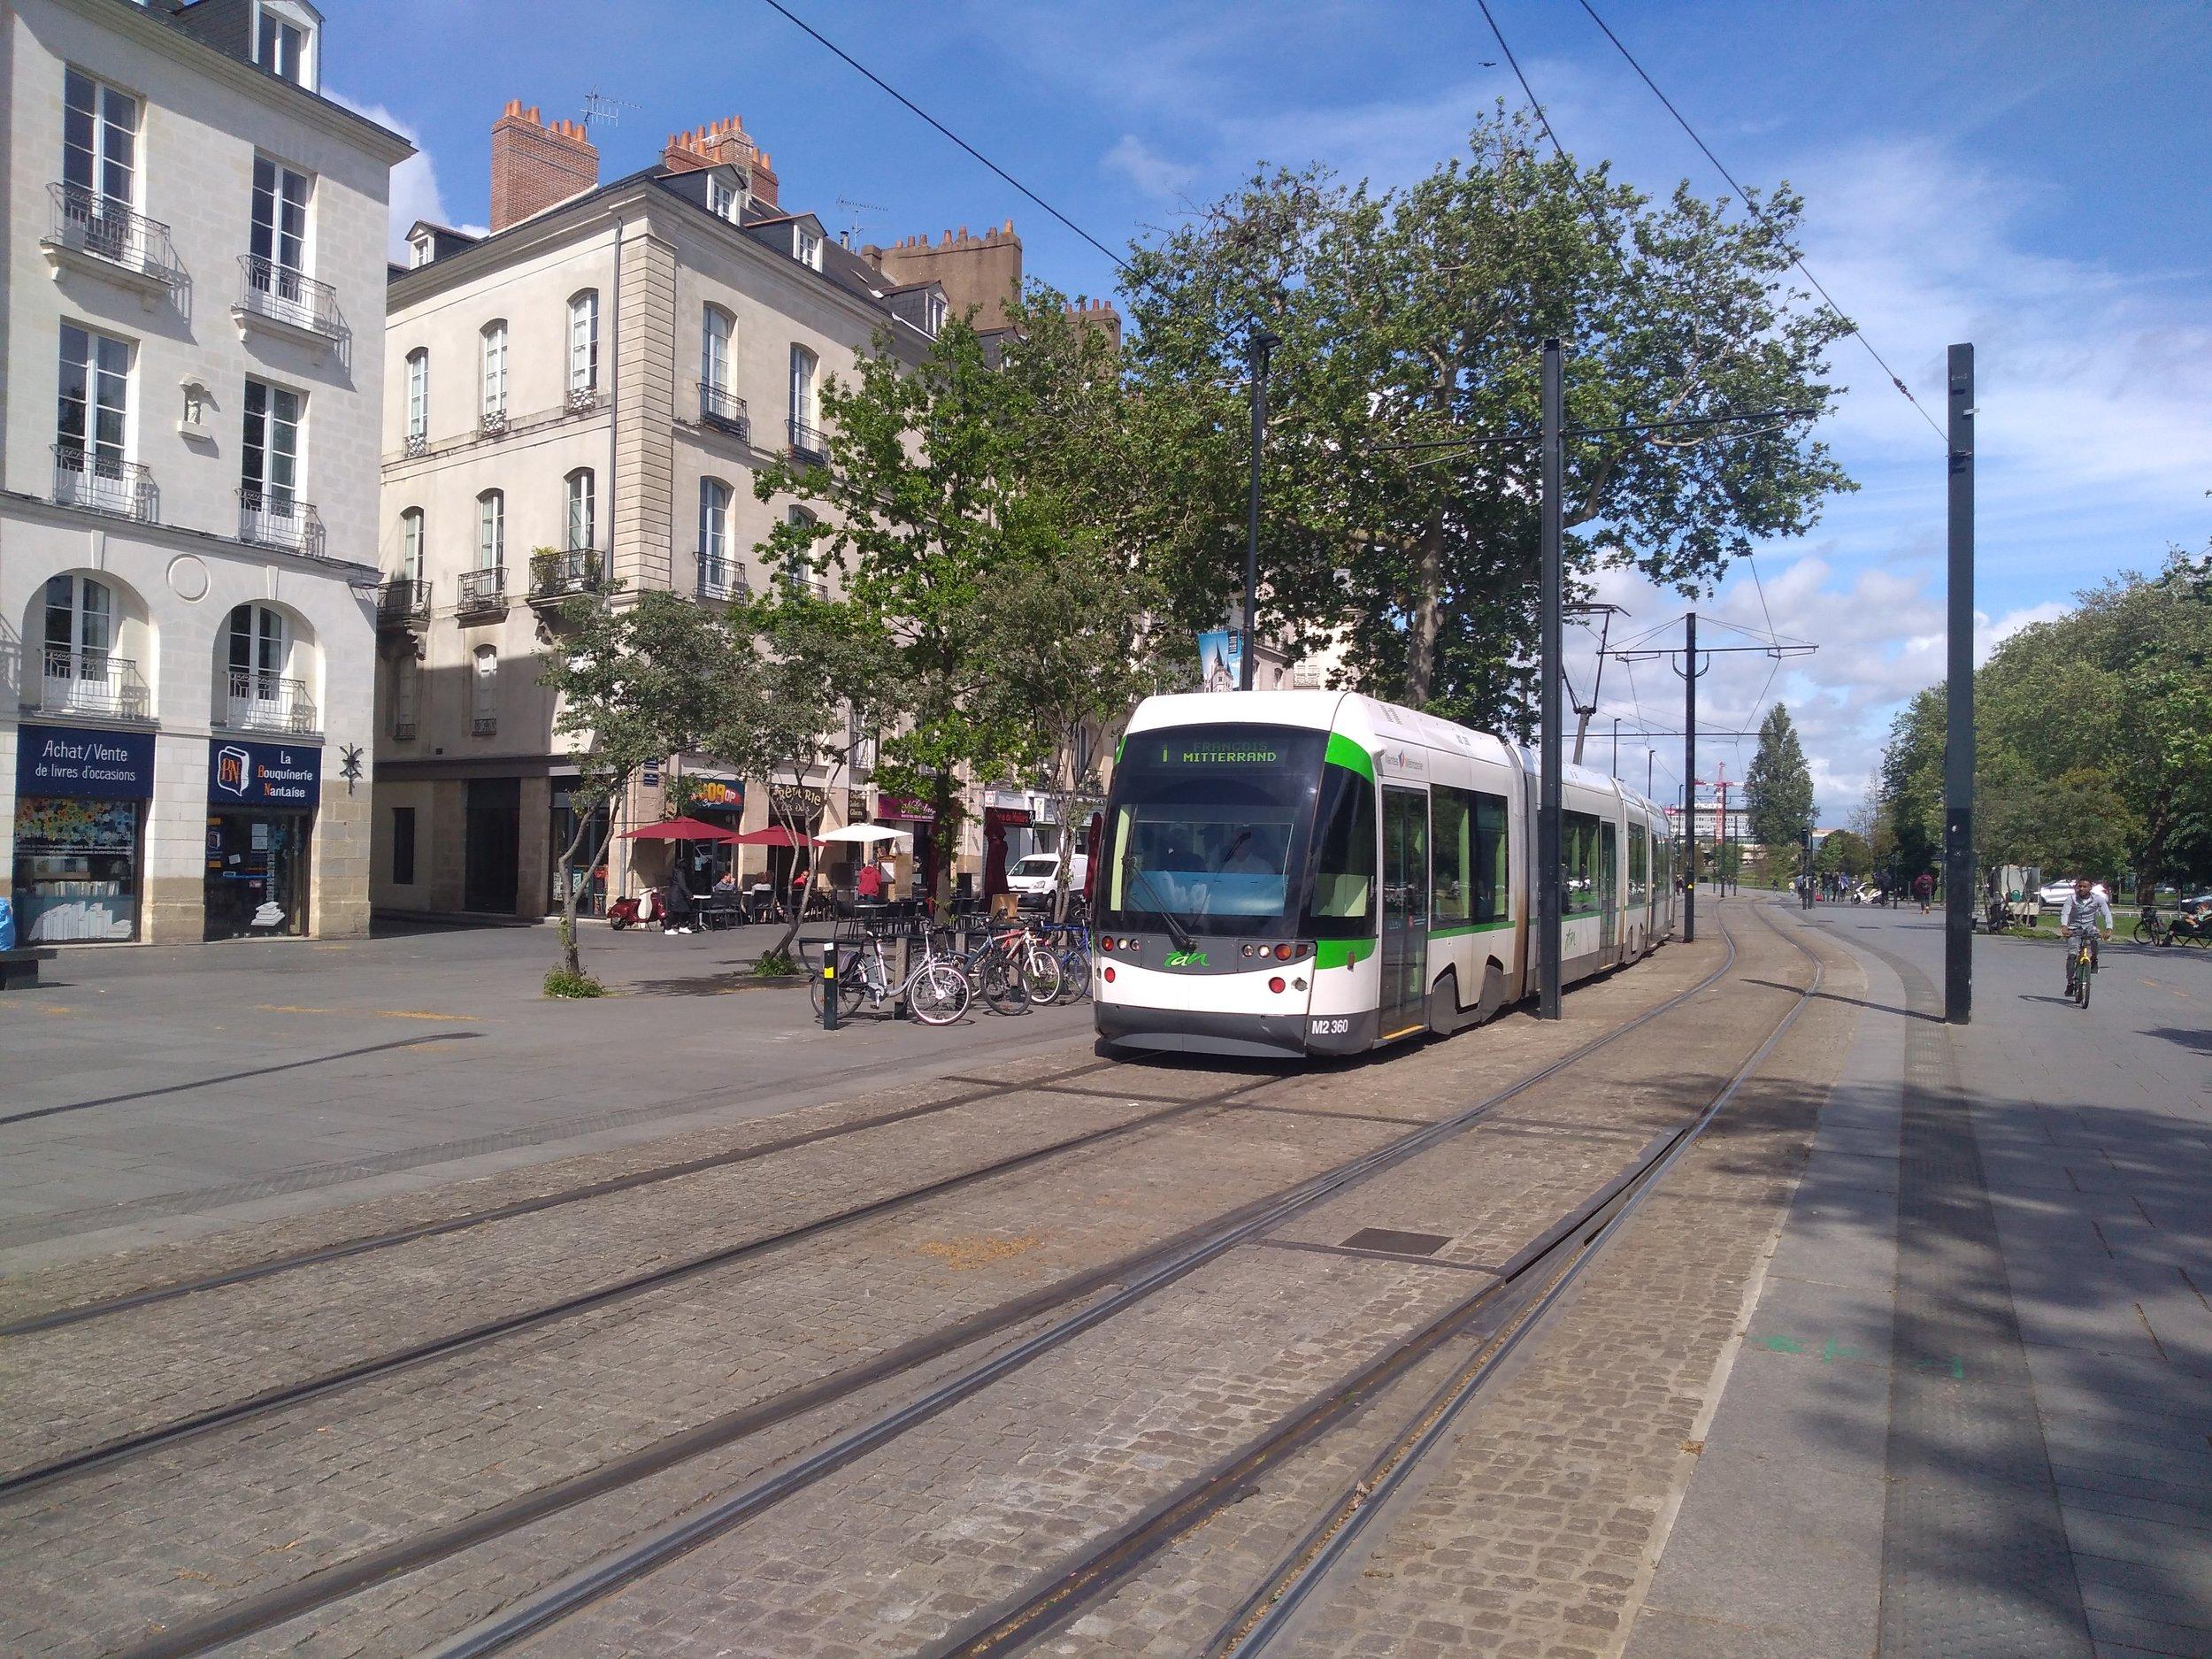 Dnes už skoro dvě dekády stará tramvaj Adtranz Incentro. Hádal by jí někdo tento věk?